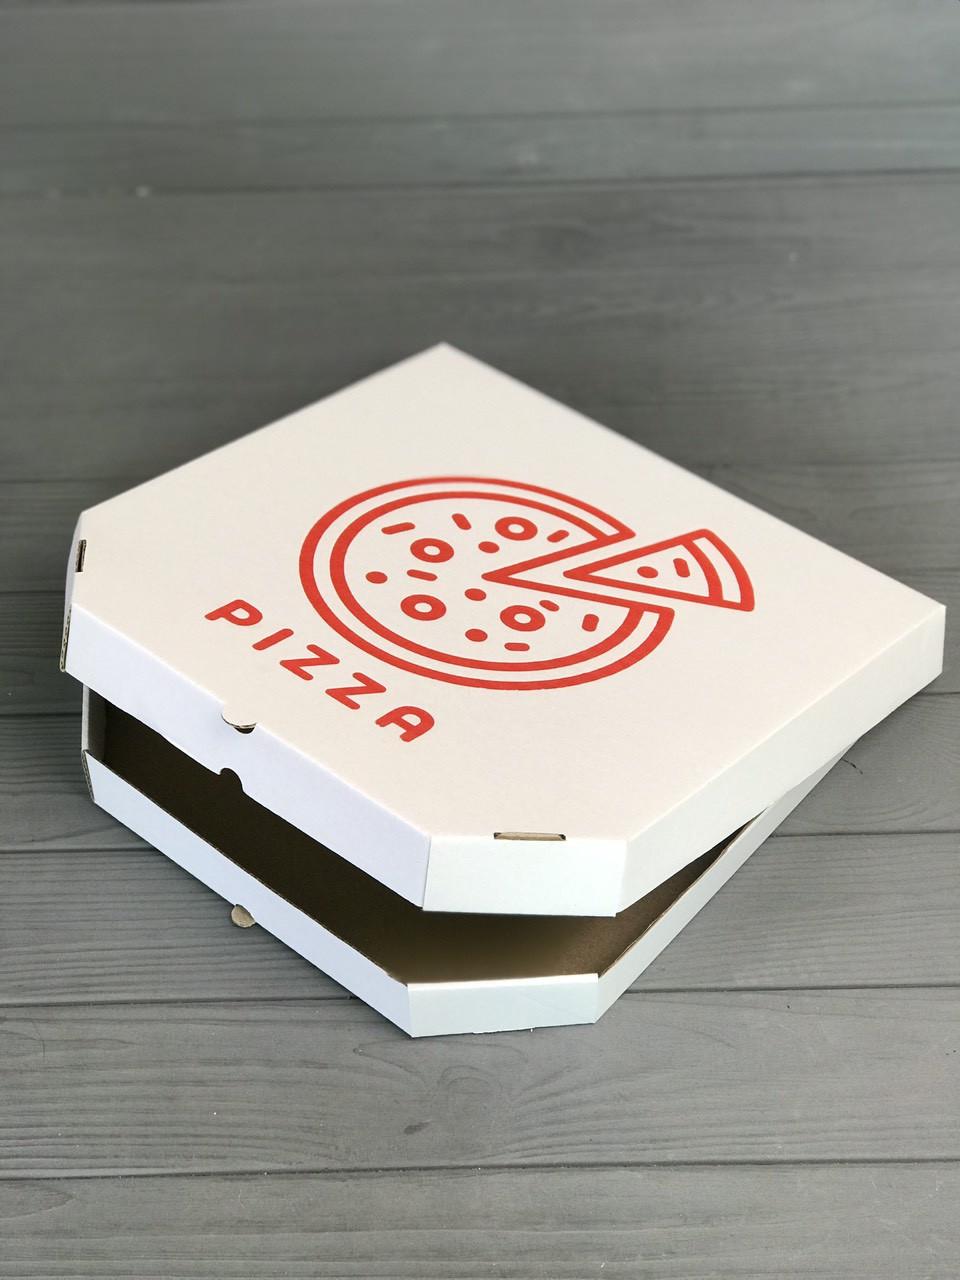 Коробка для пиццы c рисунком Pizza 300Х300Х30 мм (Красная печать)